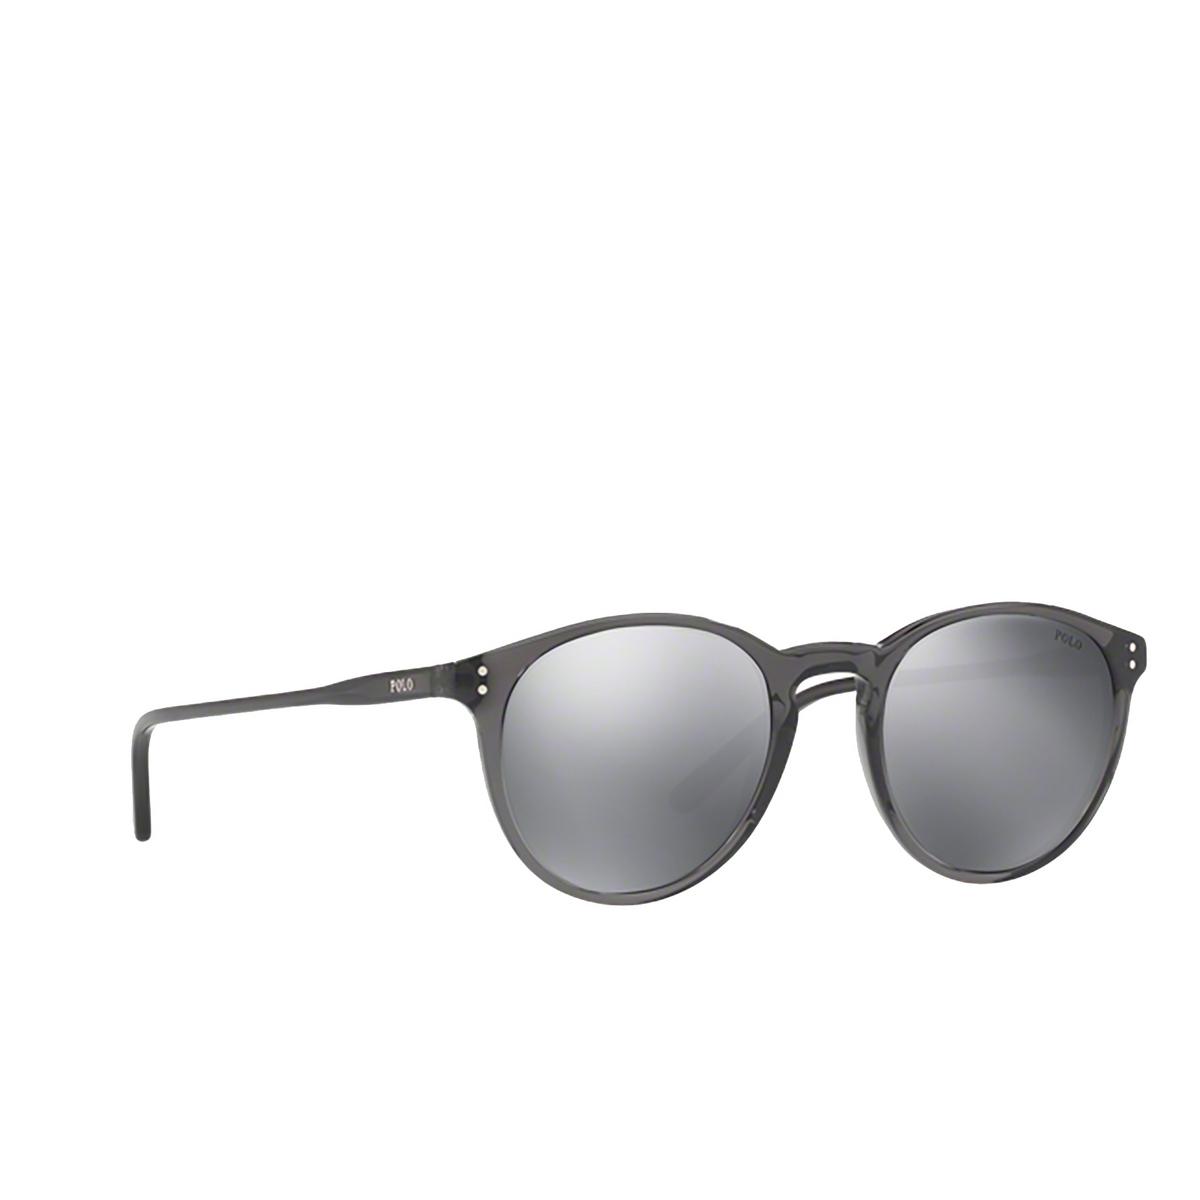 Polo Ralph Lauren® Round Sunglasses: PH4110 color Shiny Black Crystal 55366G - three-quarters view.